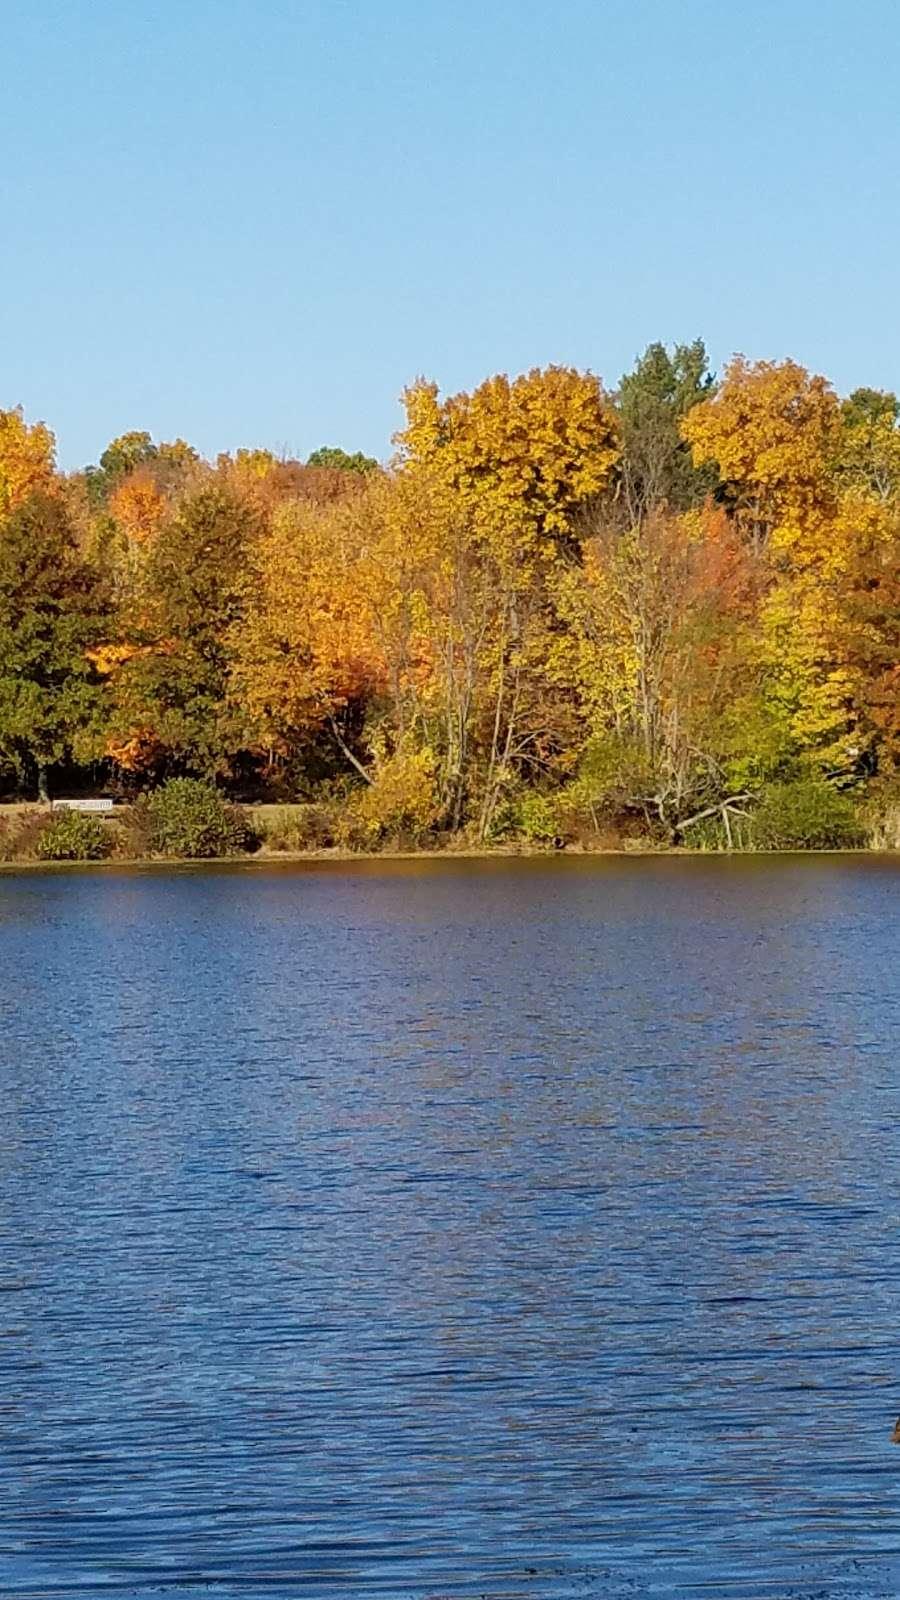 Heistein Park - park  | Photo 9 of 10 | Address: Randolph, NJ 07869, USA | Phone: (973) 989-7100